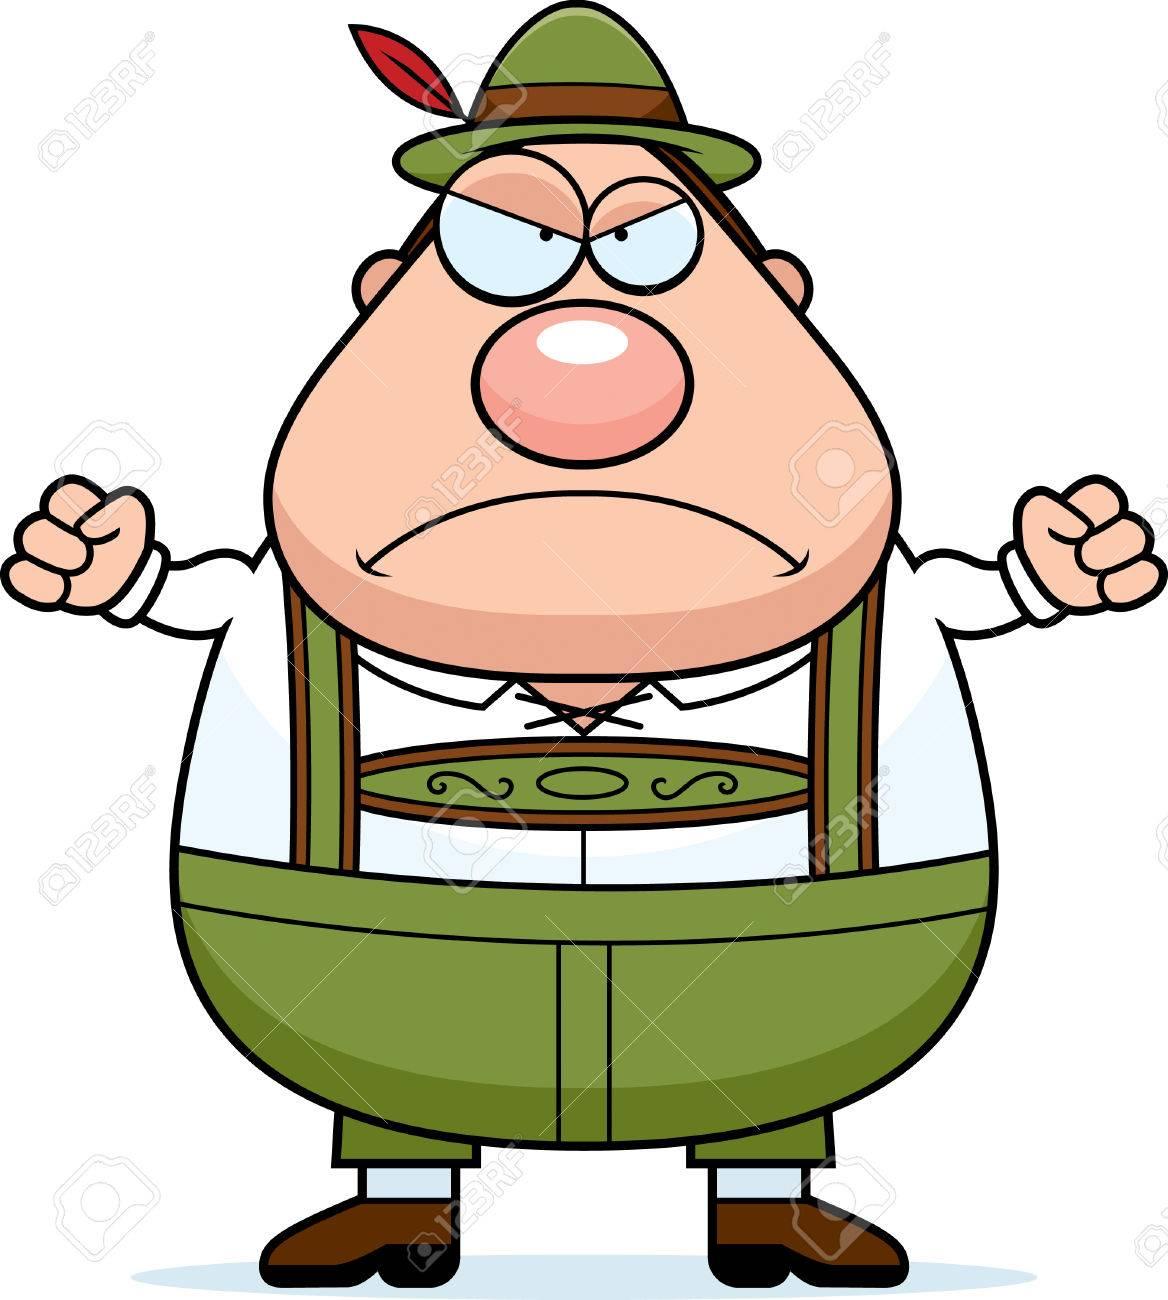 A cartoon illustration of a German man in lederhosen looking...